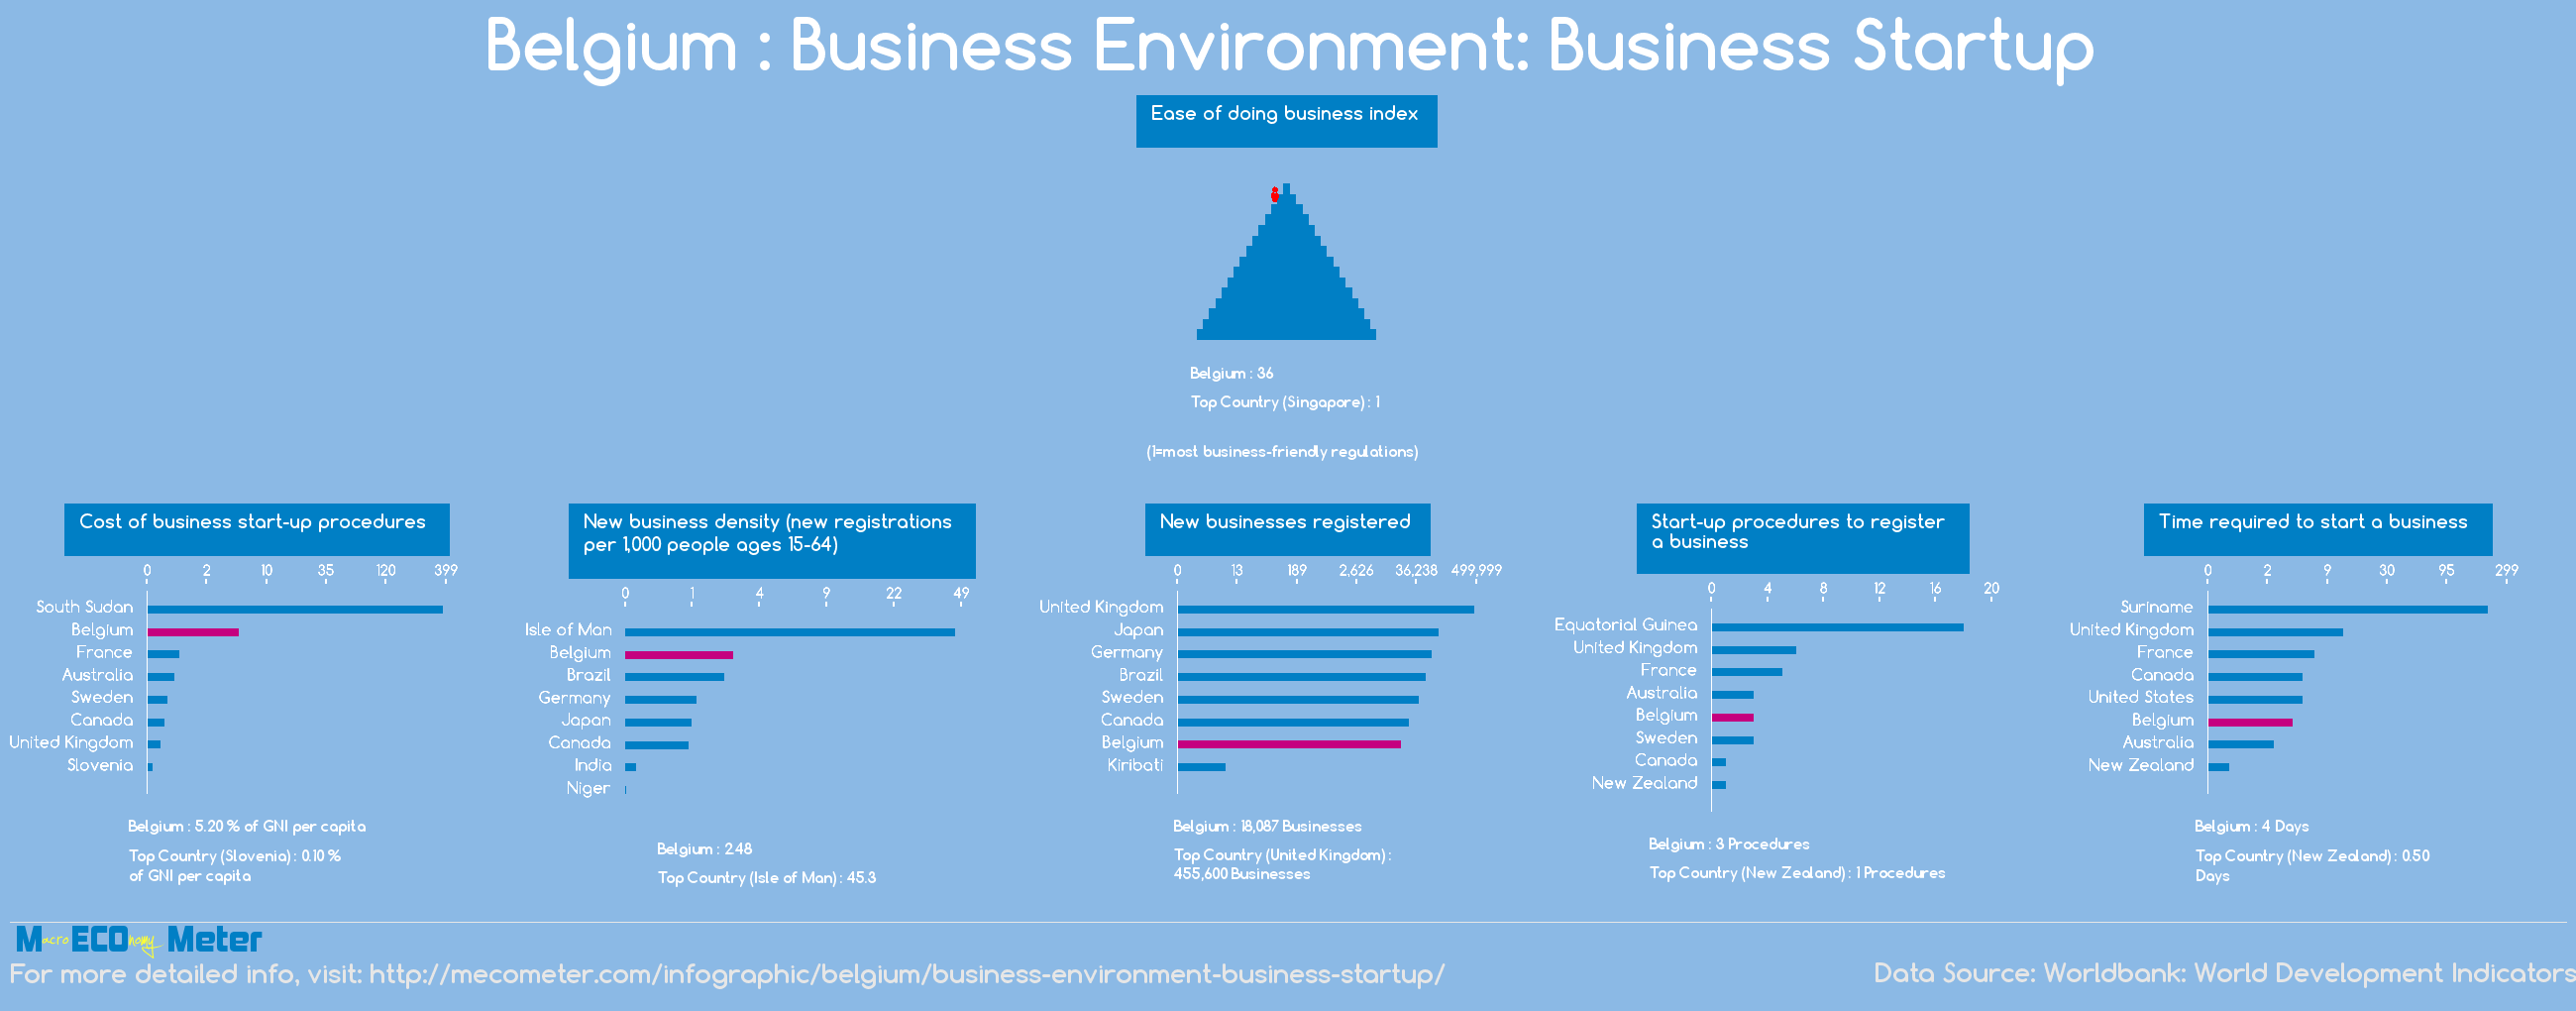 Belgium : Business Environment: Business Startup